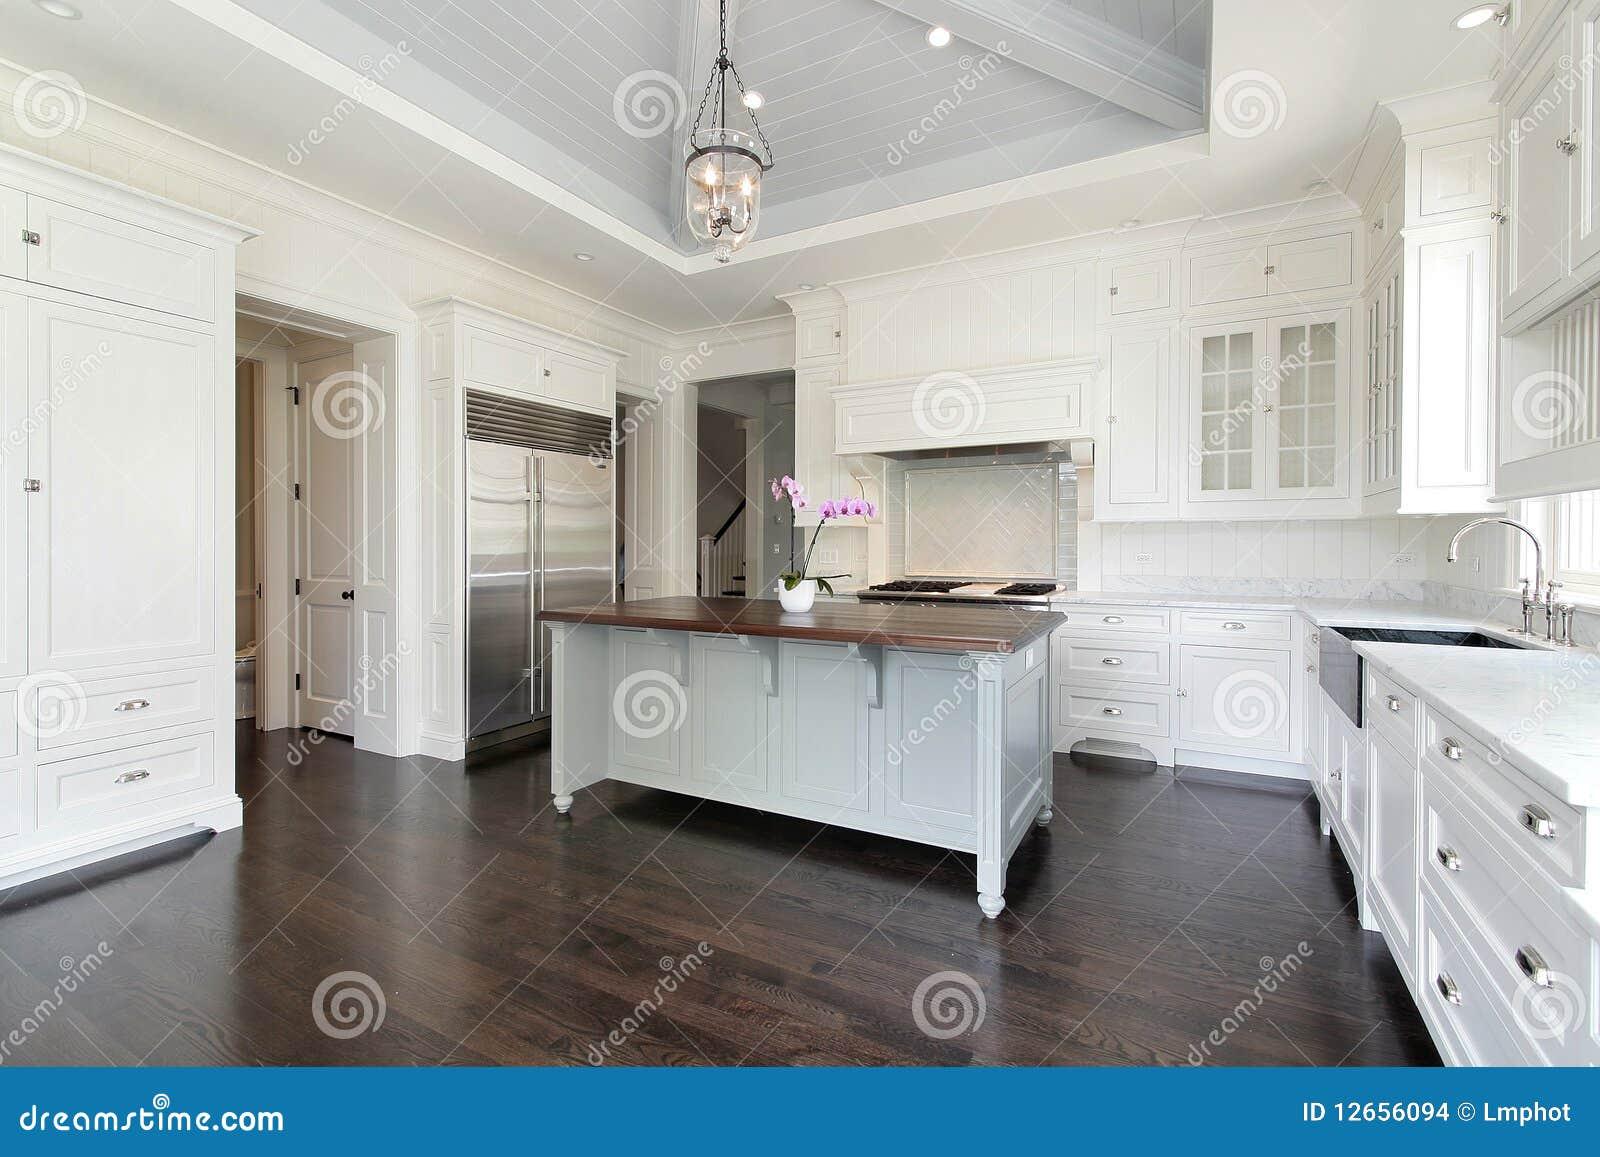 Smalle Keuken Ideeen.Grote Keukenkast Grote Teak Buffet Keukenkast Dichte Zijdeuren Cm